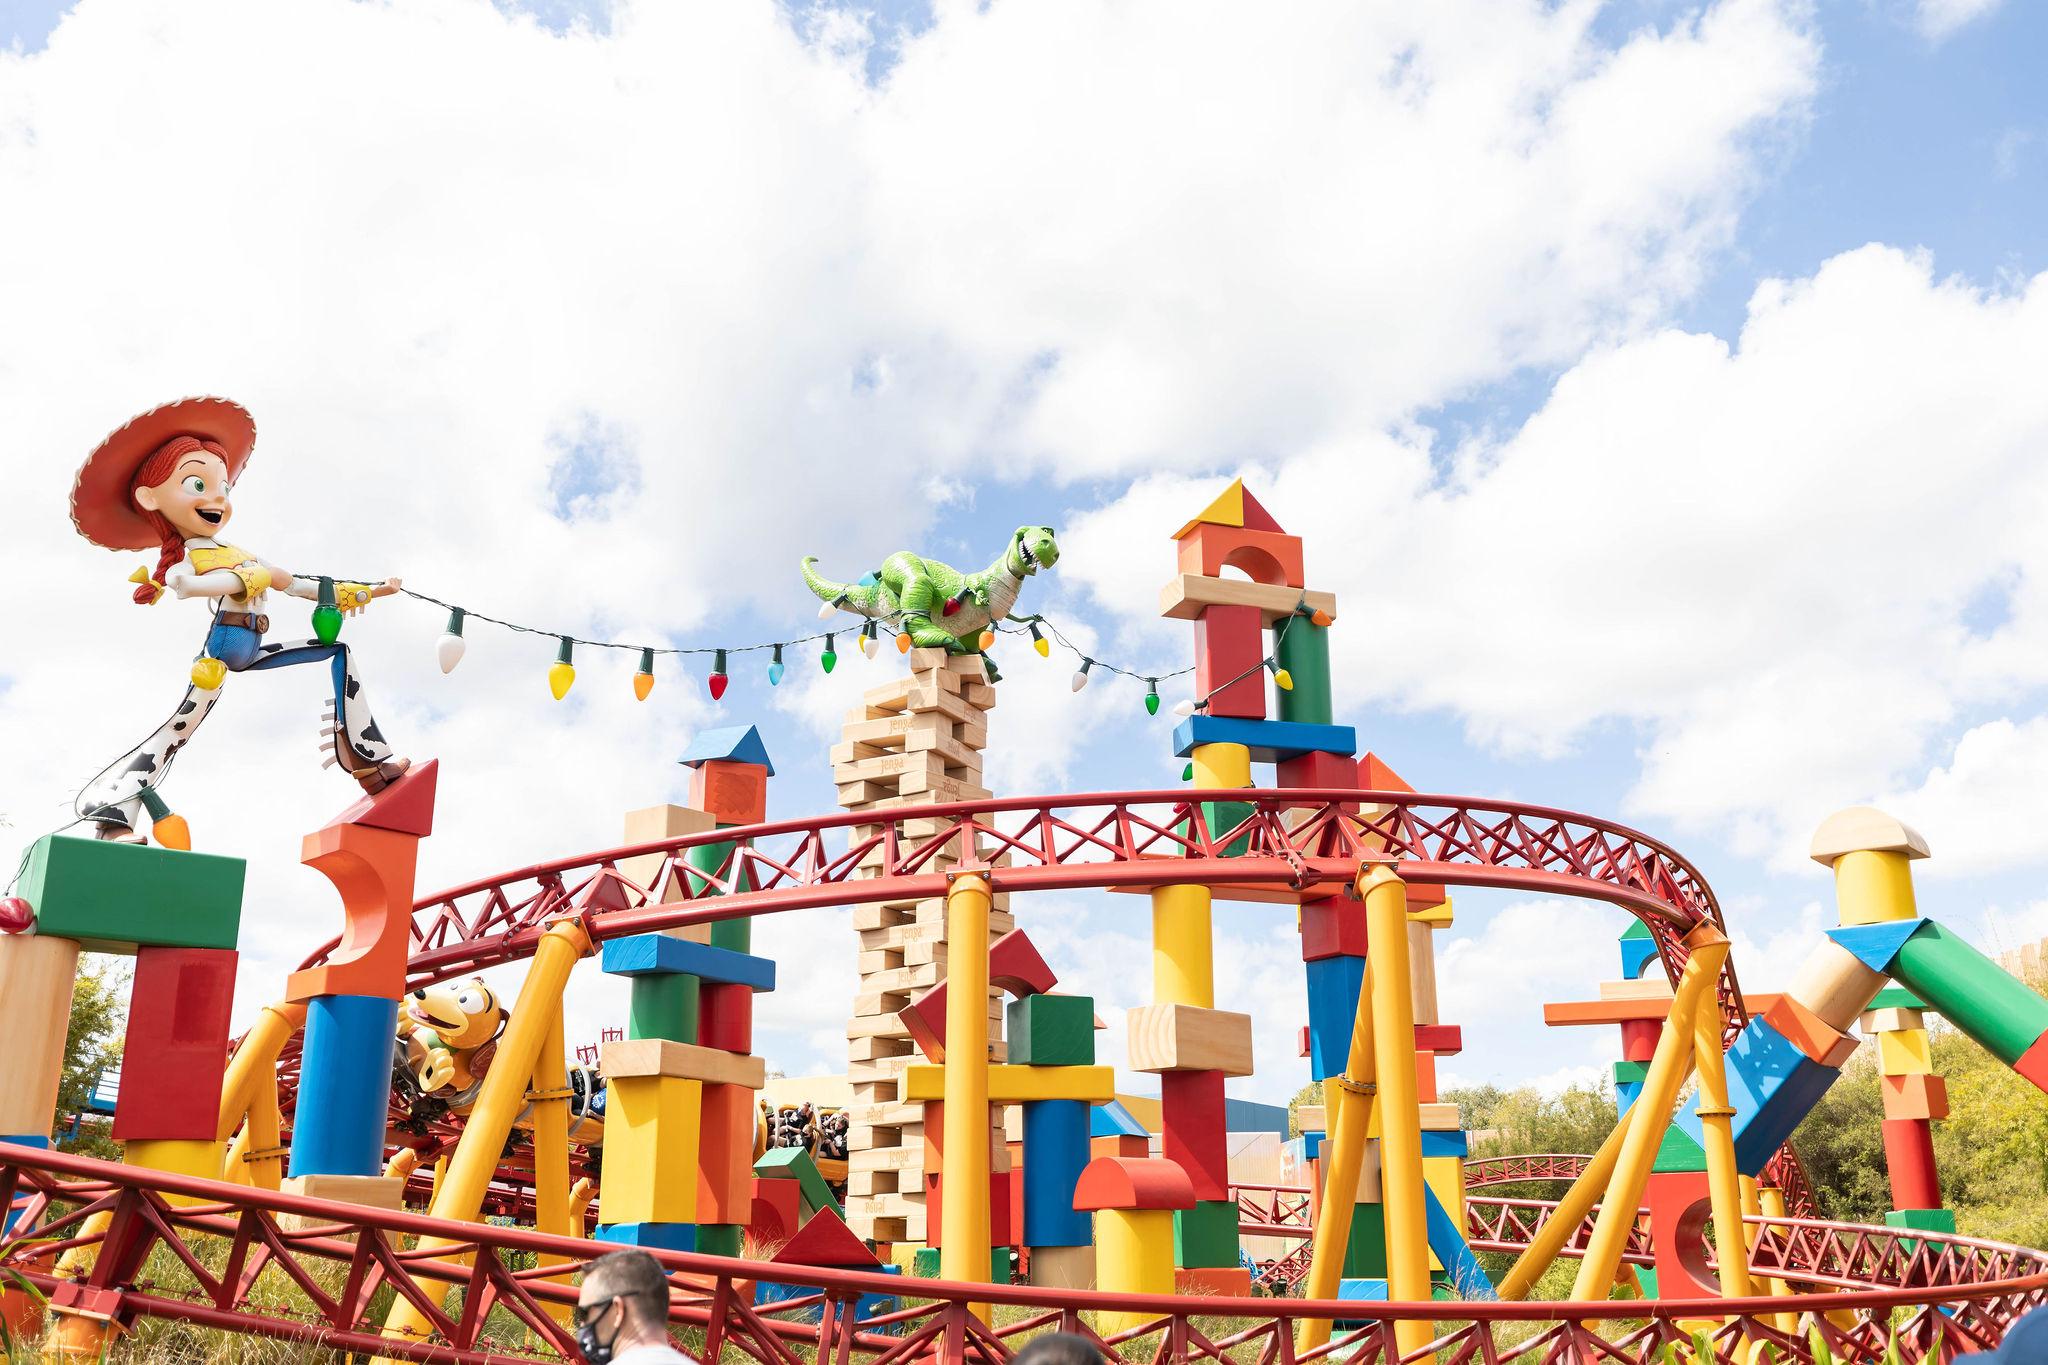 Toy Story Mania Slinky Dog Coaster Hollywood Studios Walt Disney World Photographed by Annie Fairfax